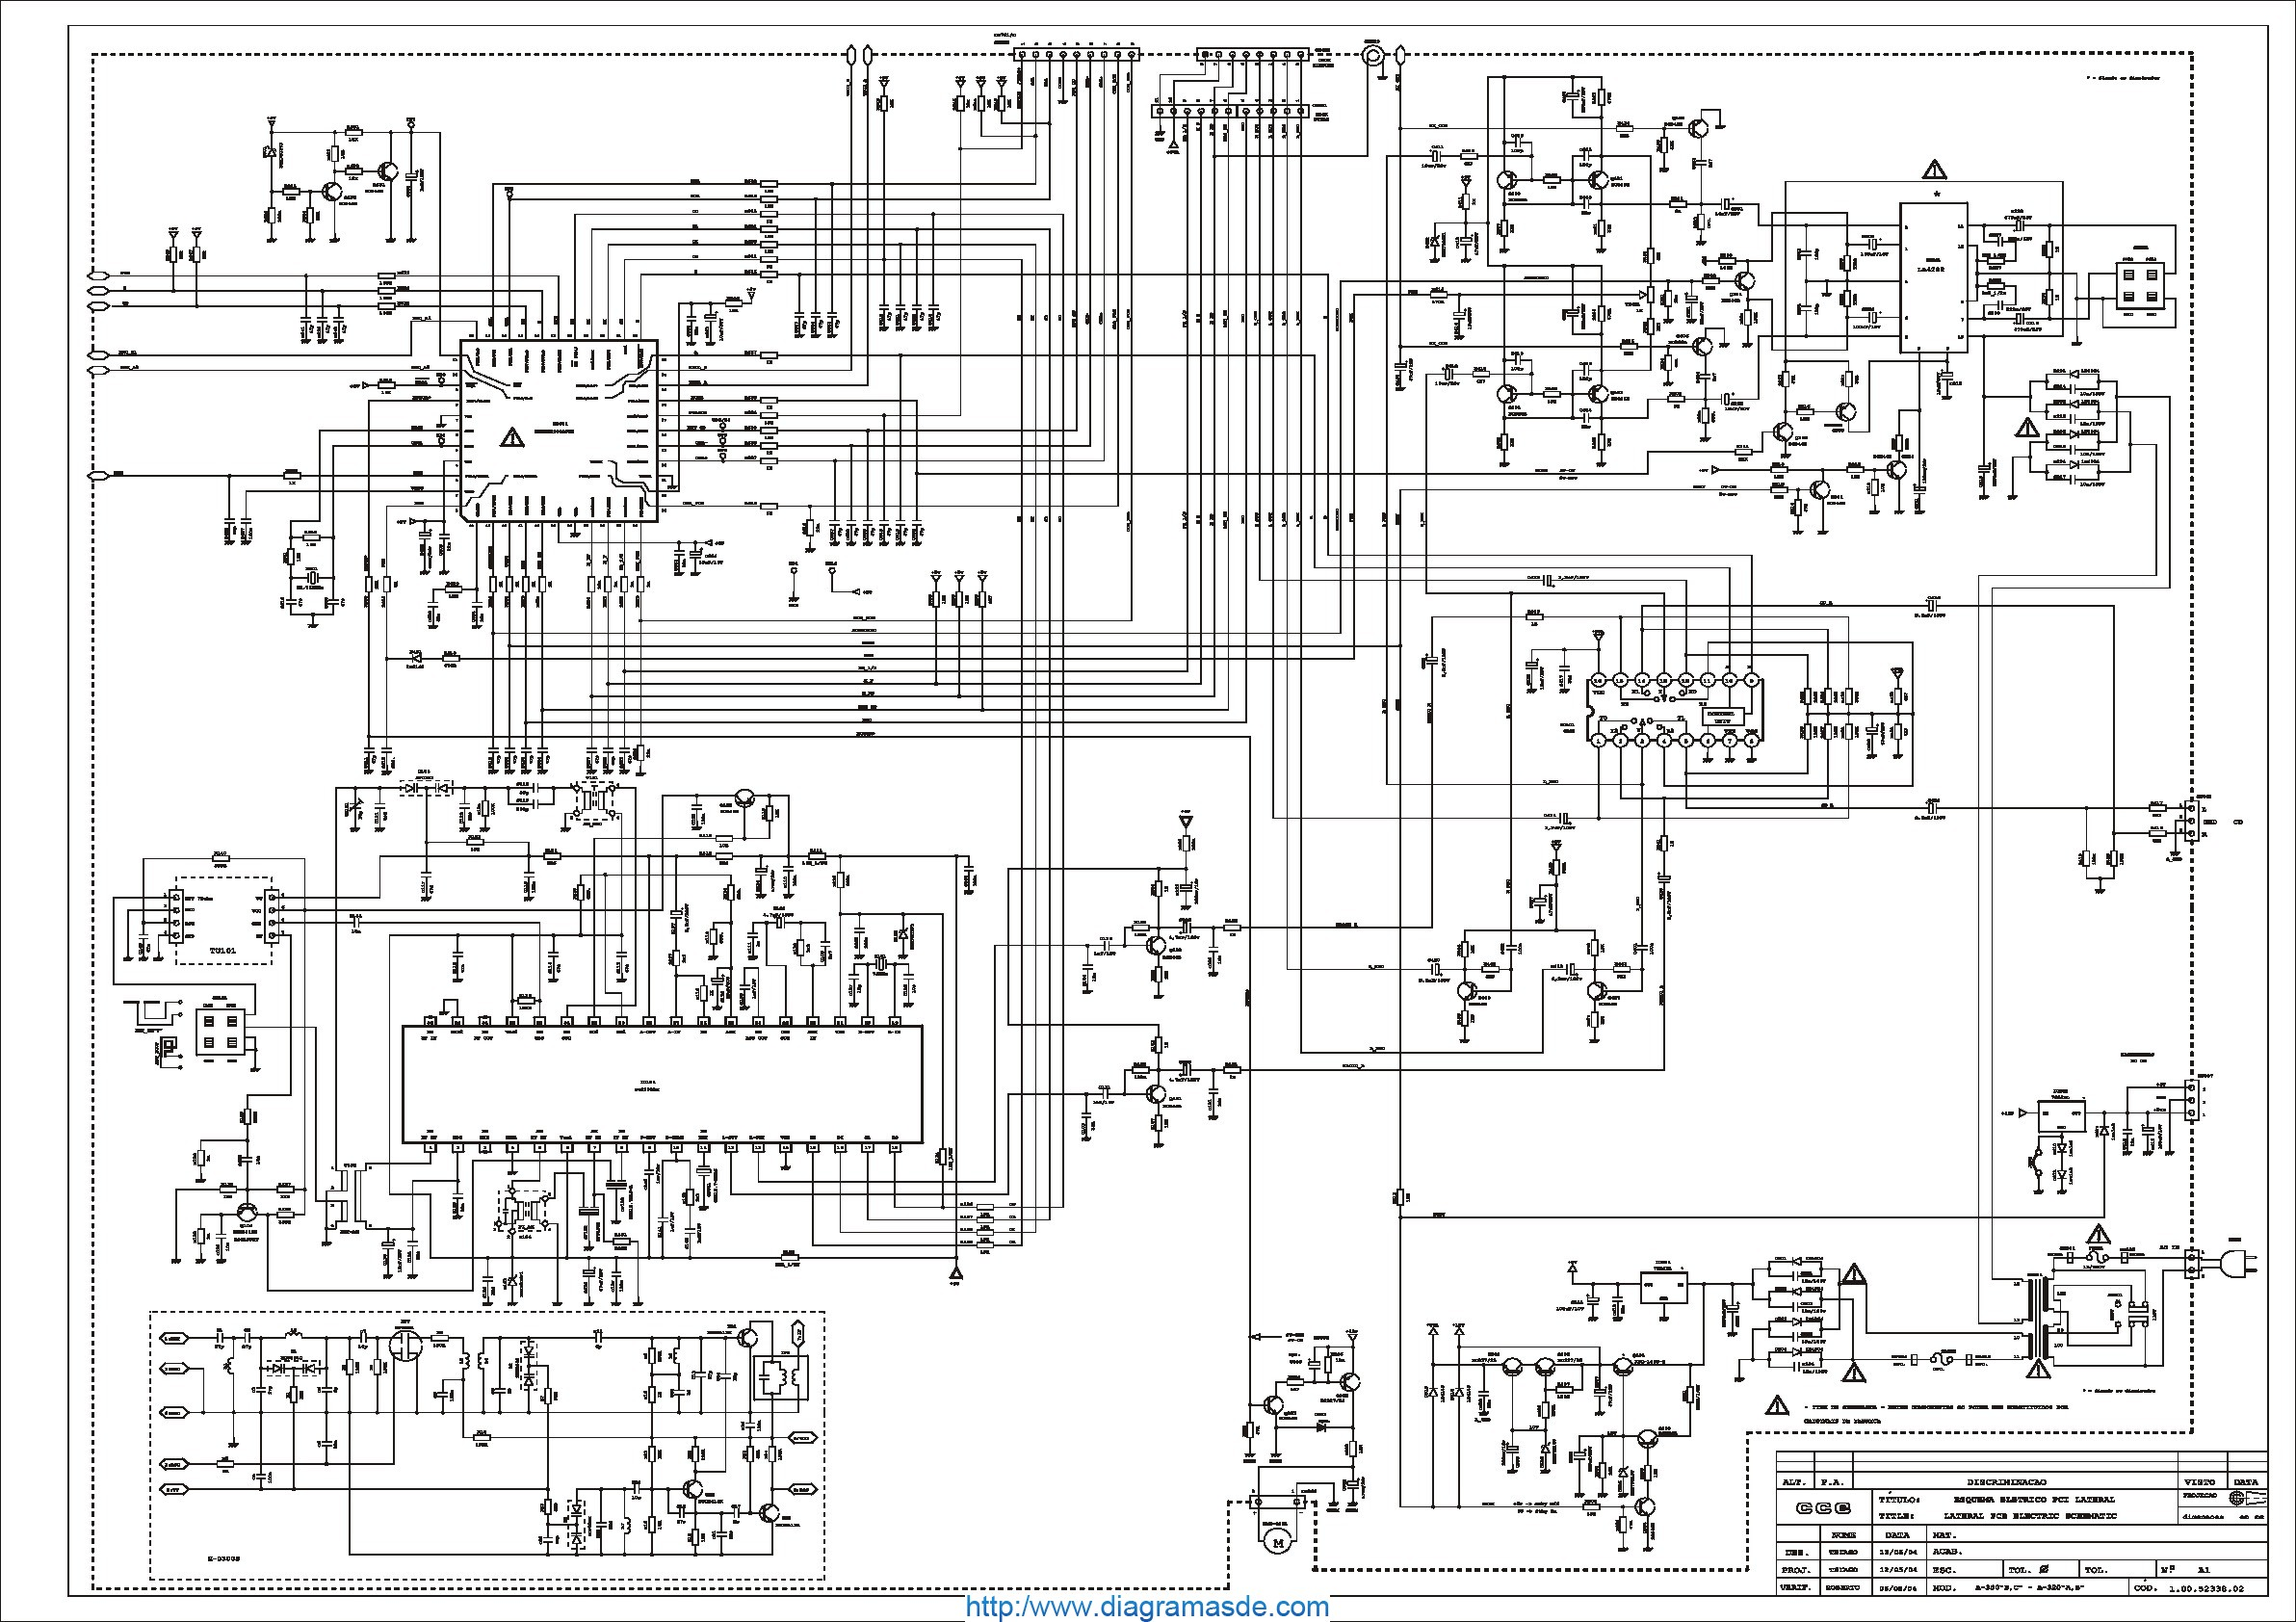 CCE Audio A-380B Diagrama Esquematico.pdf